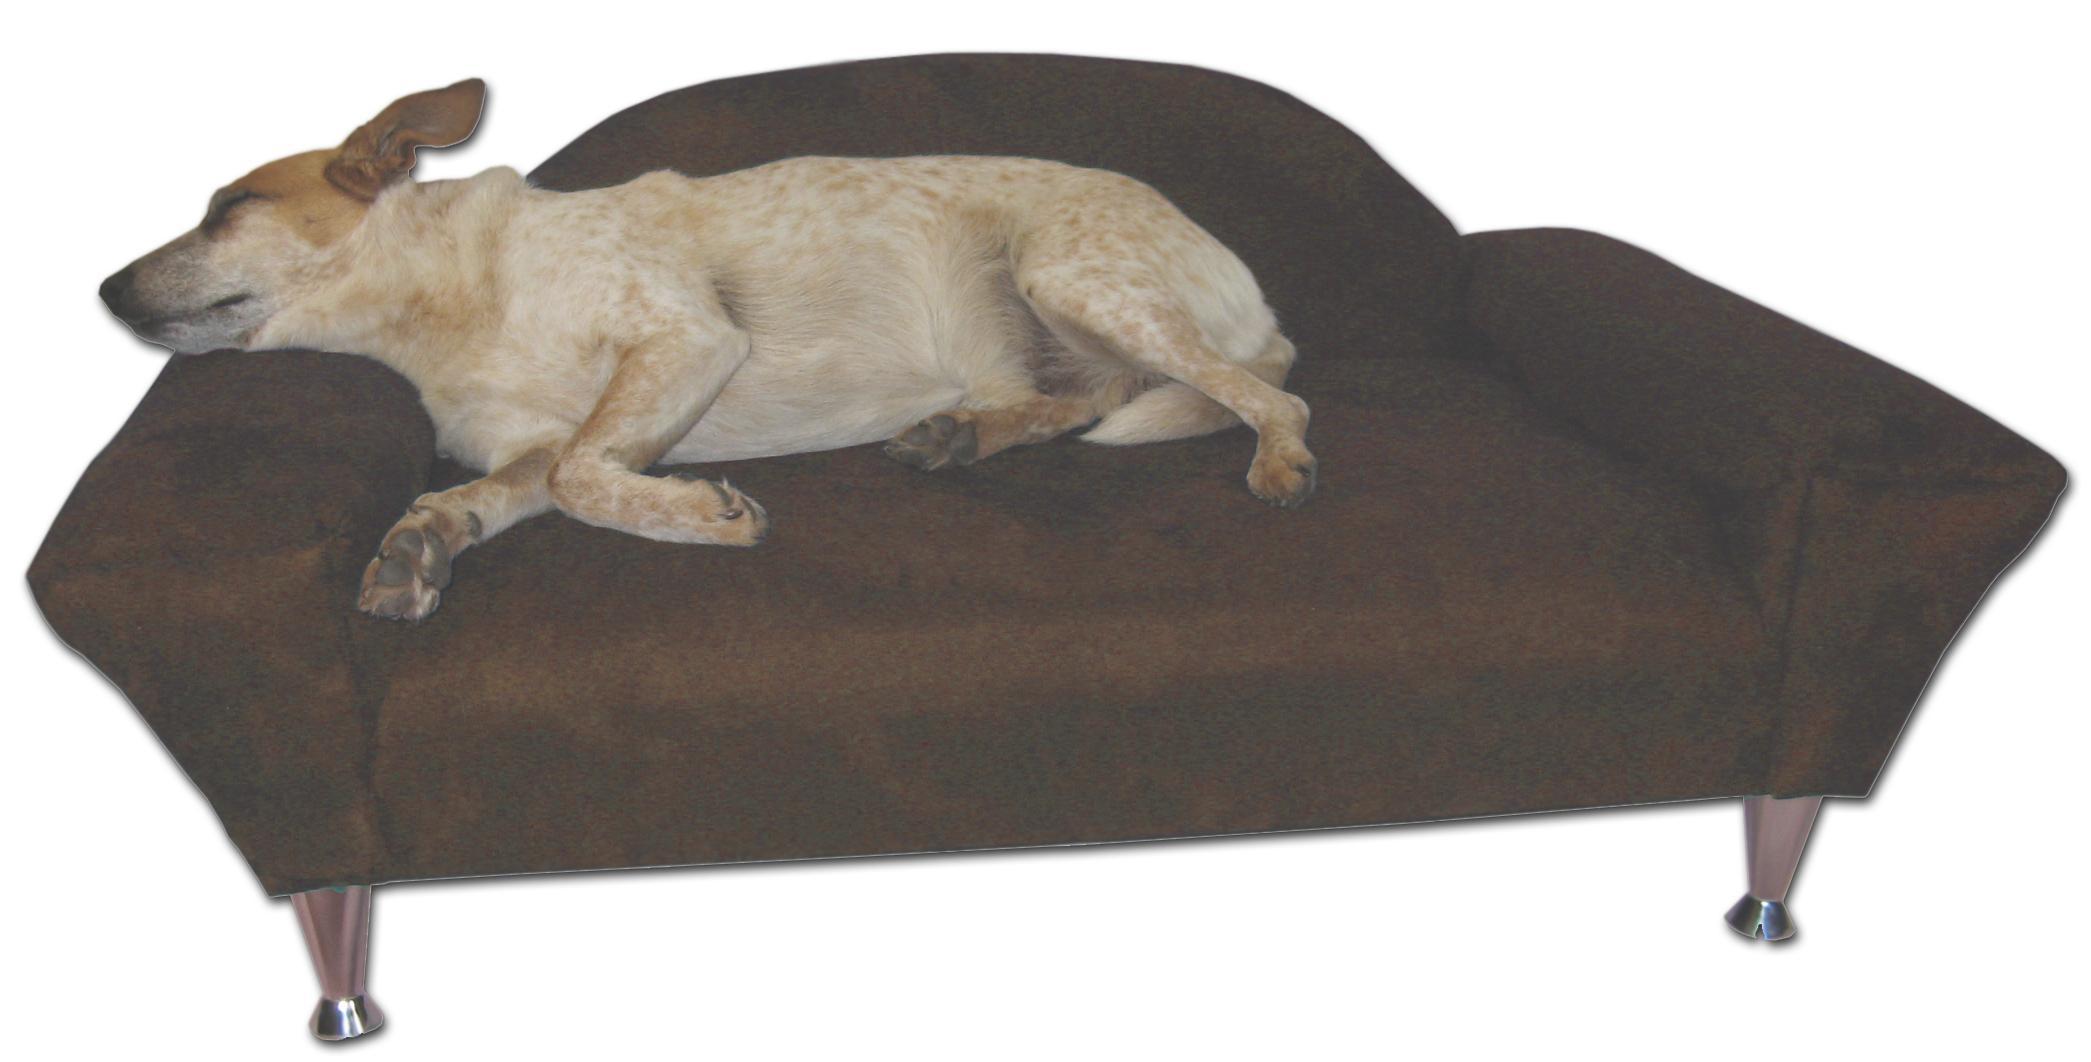 good sofa fabric for dogs acrylic paint on leather 2018 latest sofas ideas